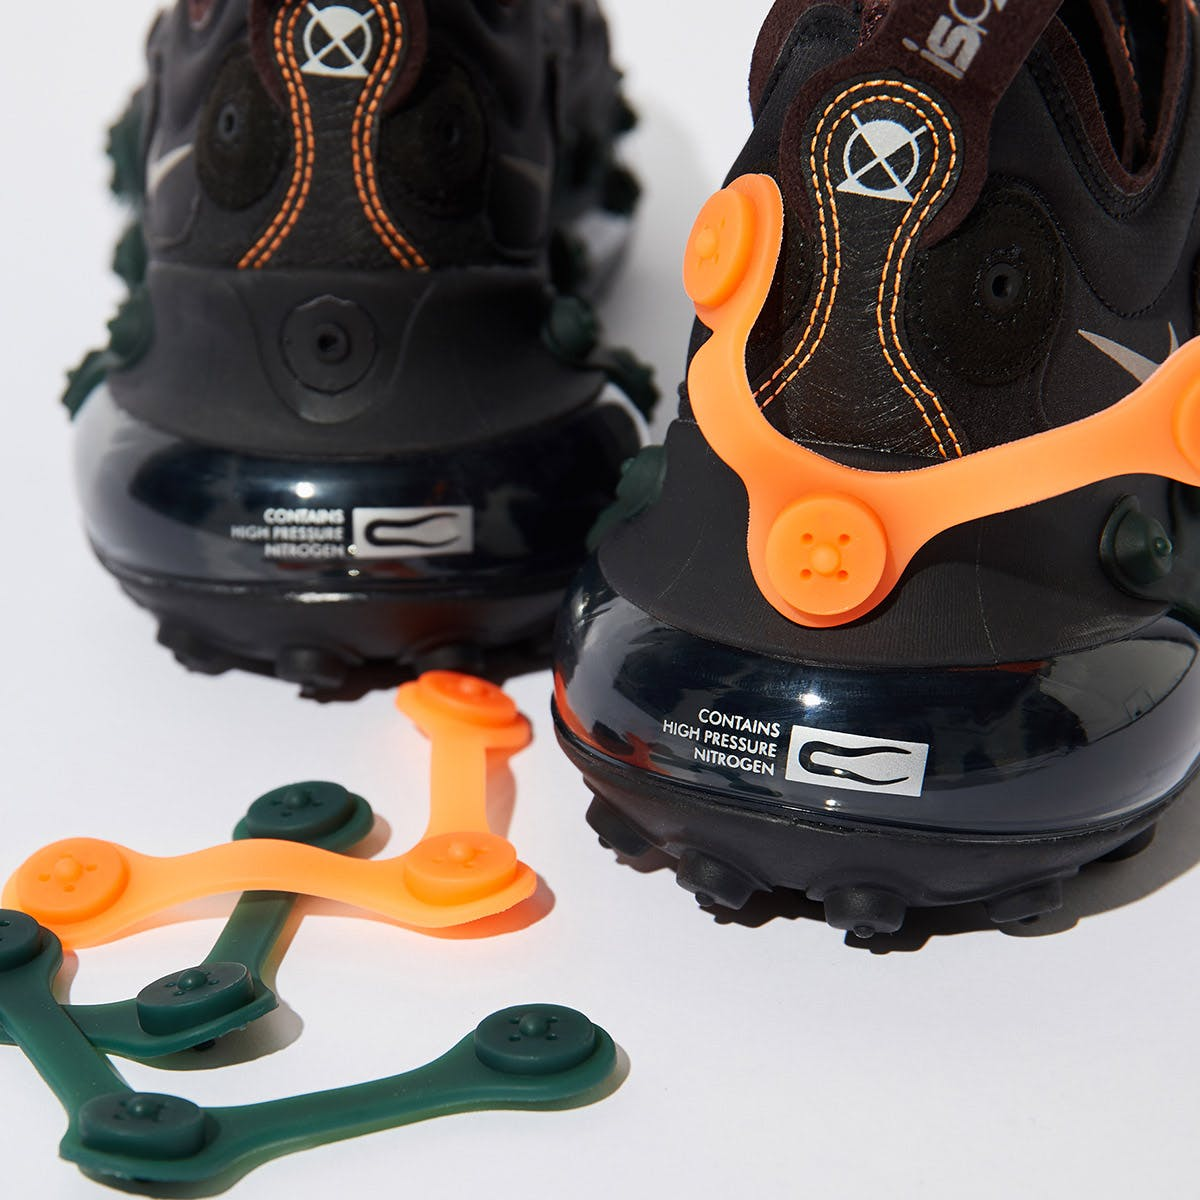 f:id:sneakerscaffetokyo:20191125154744j:plain